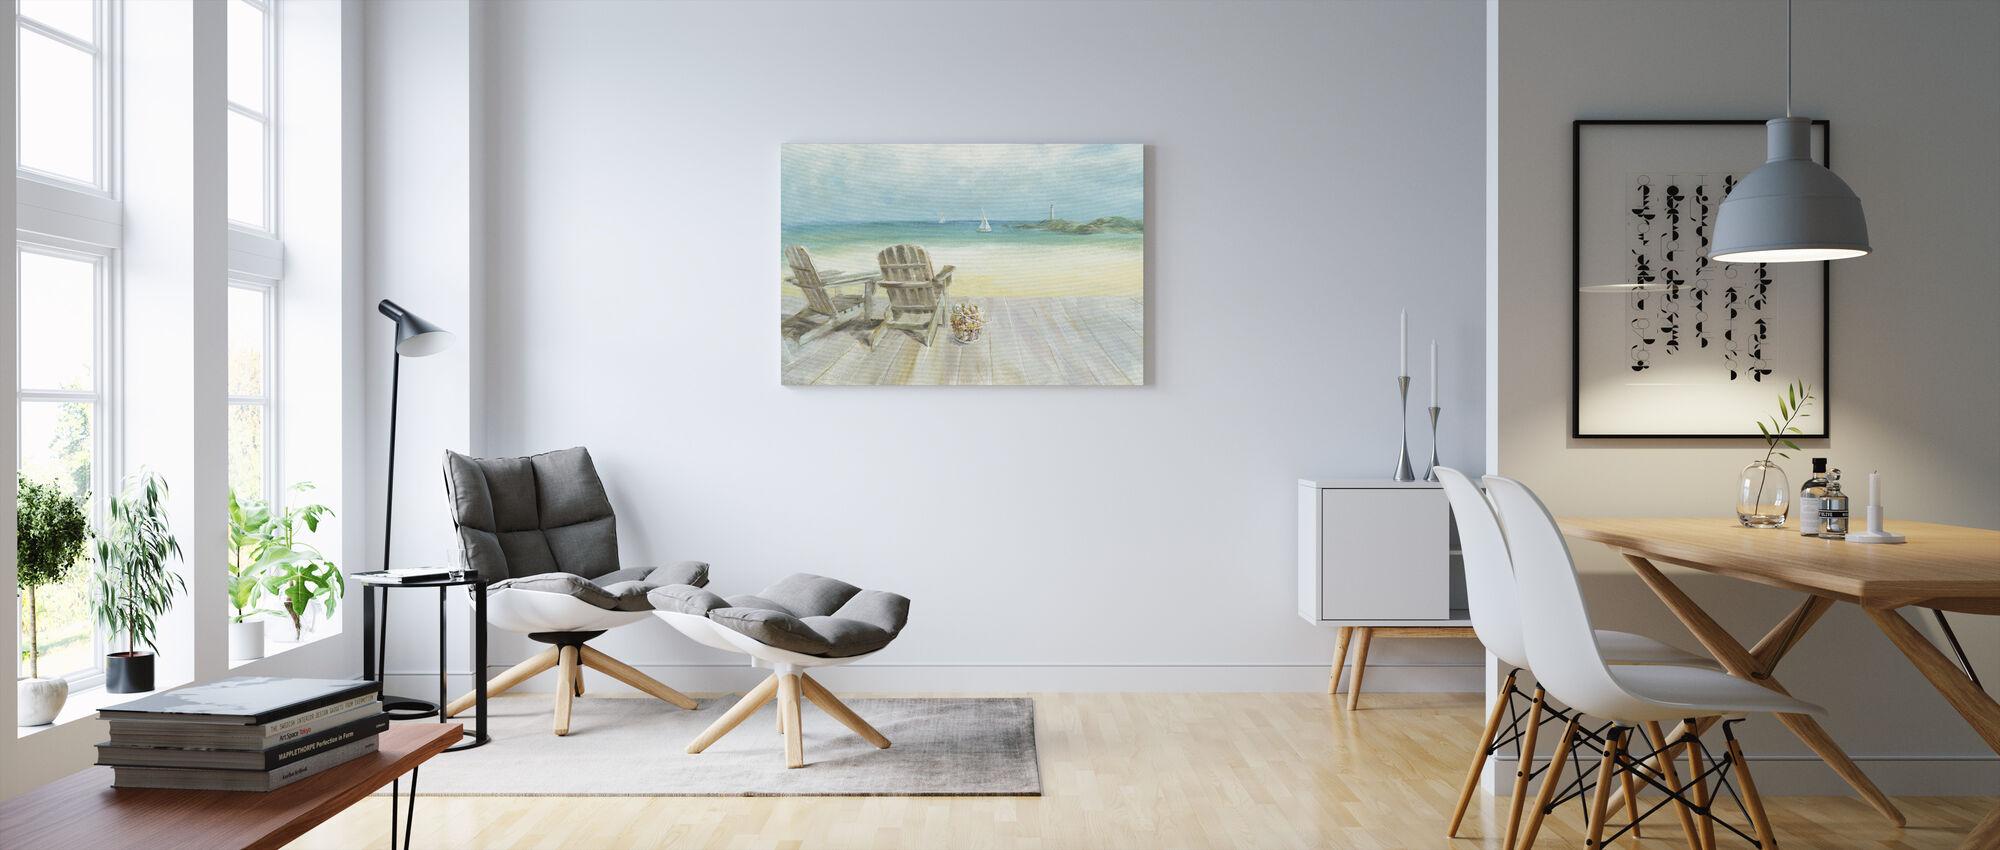 Ocean View - Canvas print - Living Room